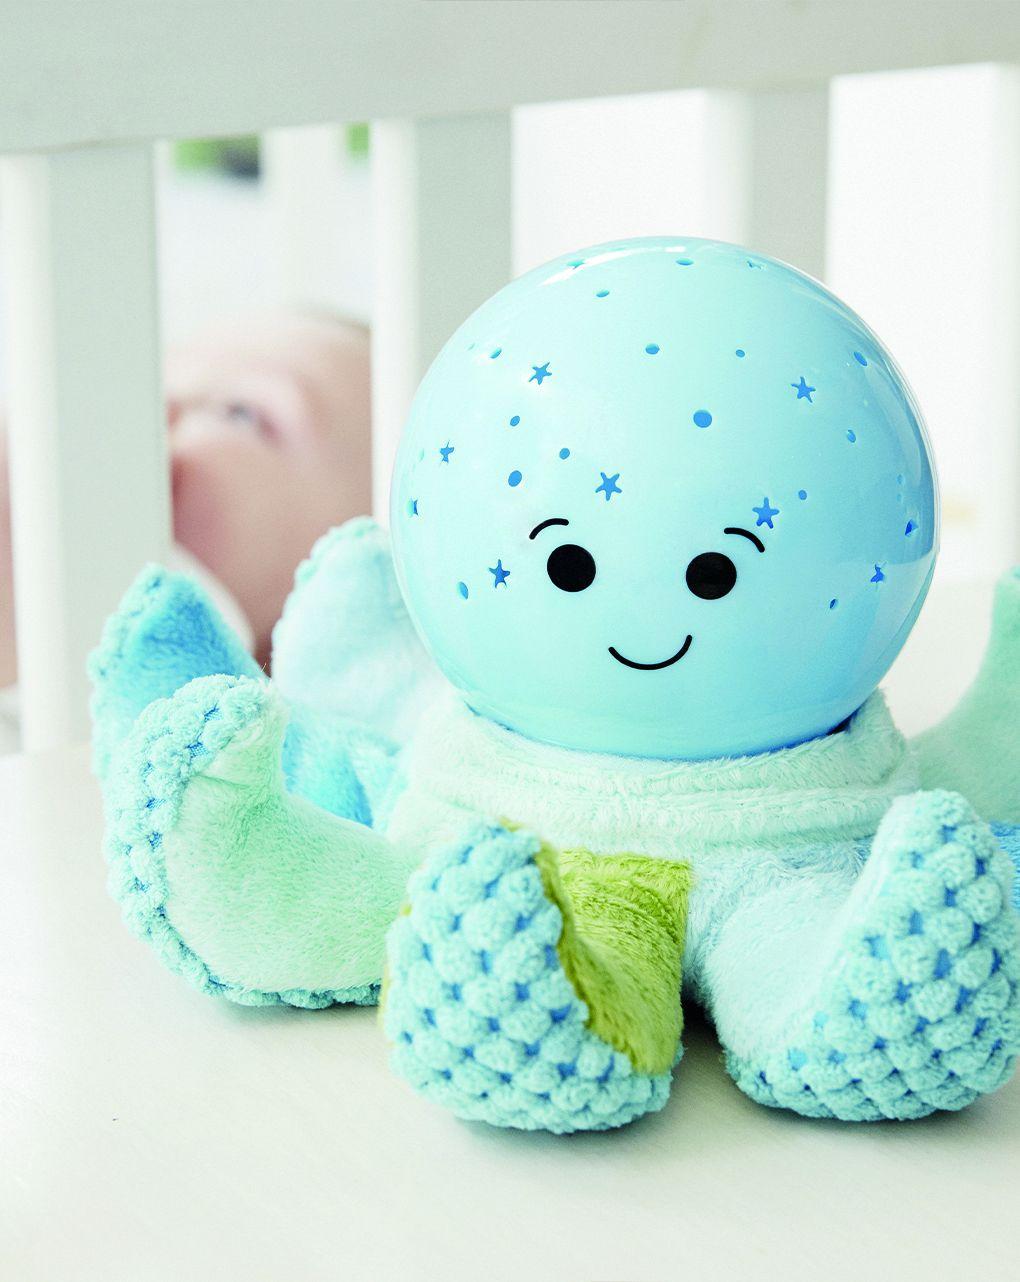 Cloud b - octo softzee blue - Cloud B